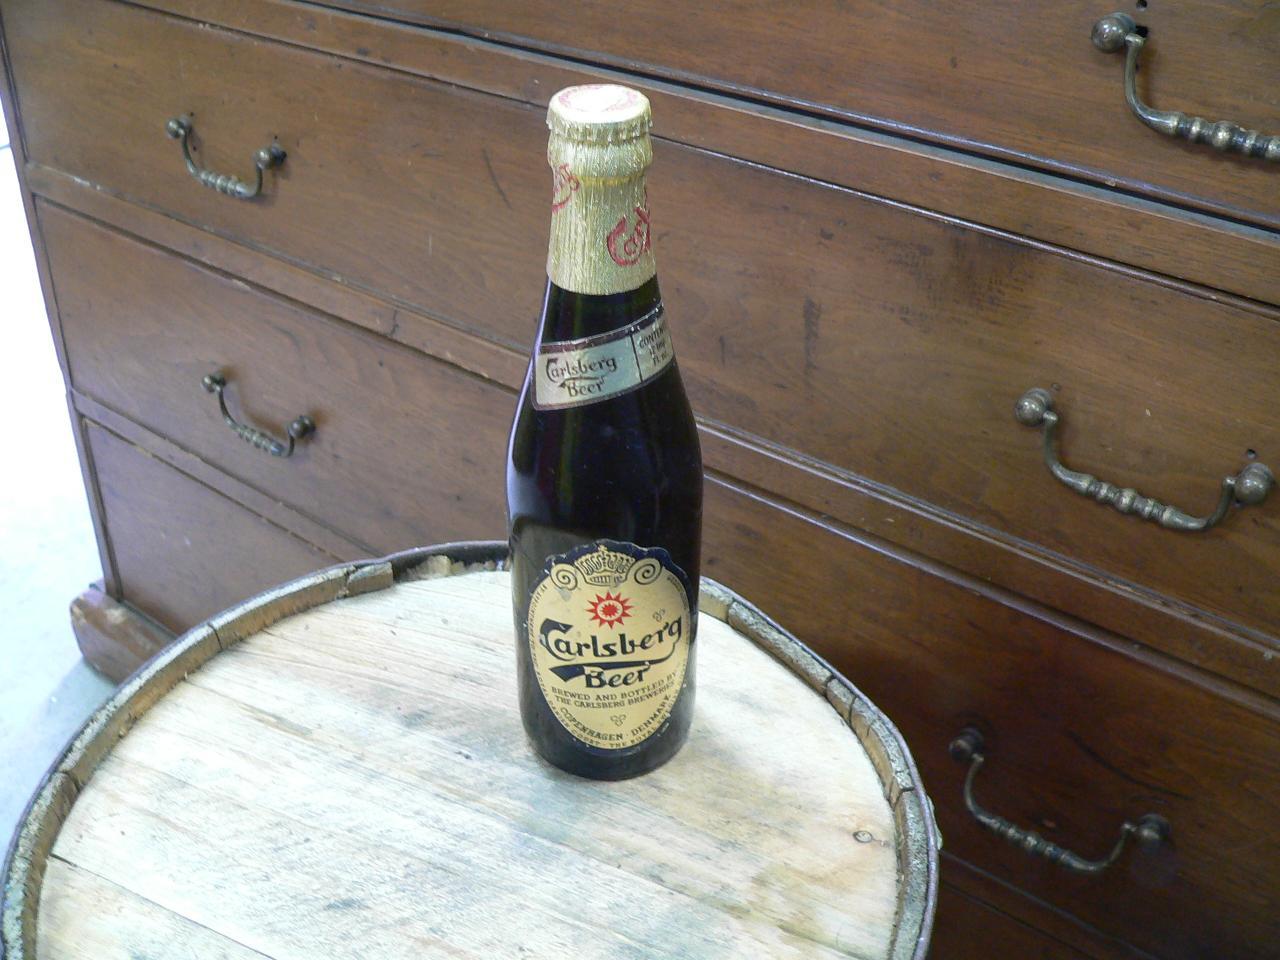 Bouteille biere carlsberg # 4664.6